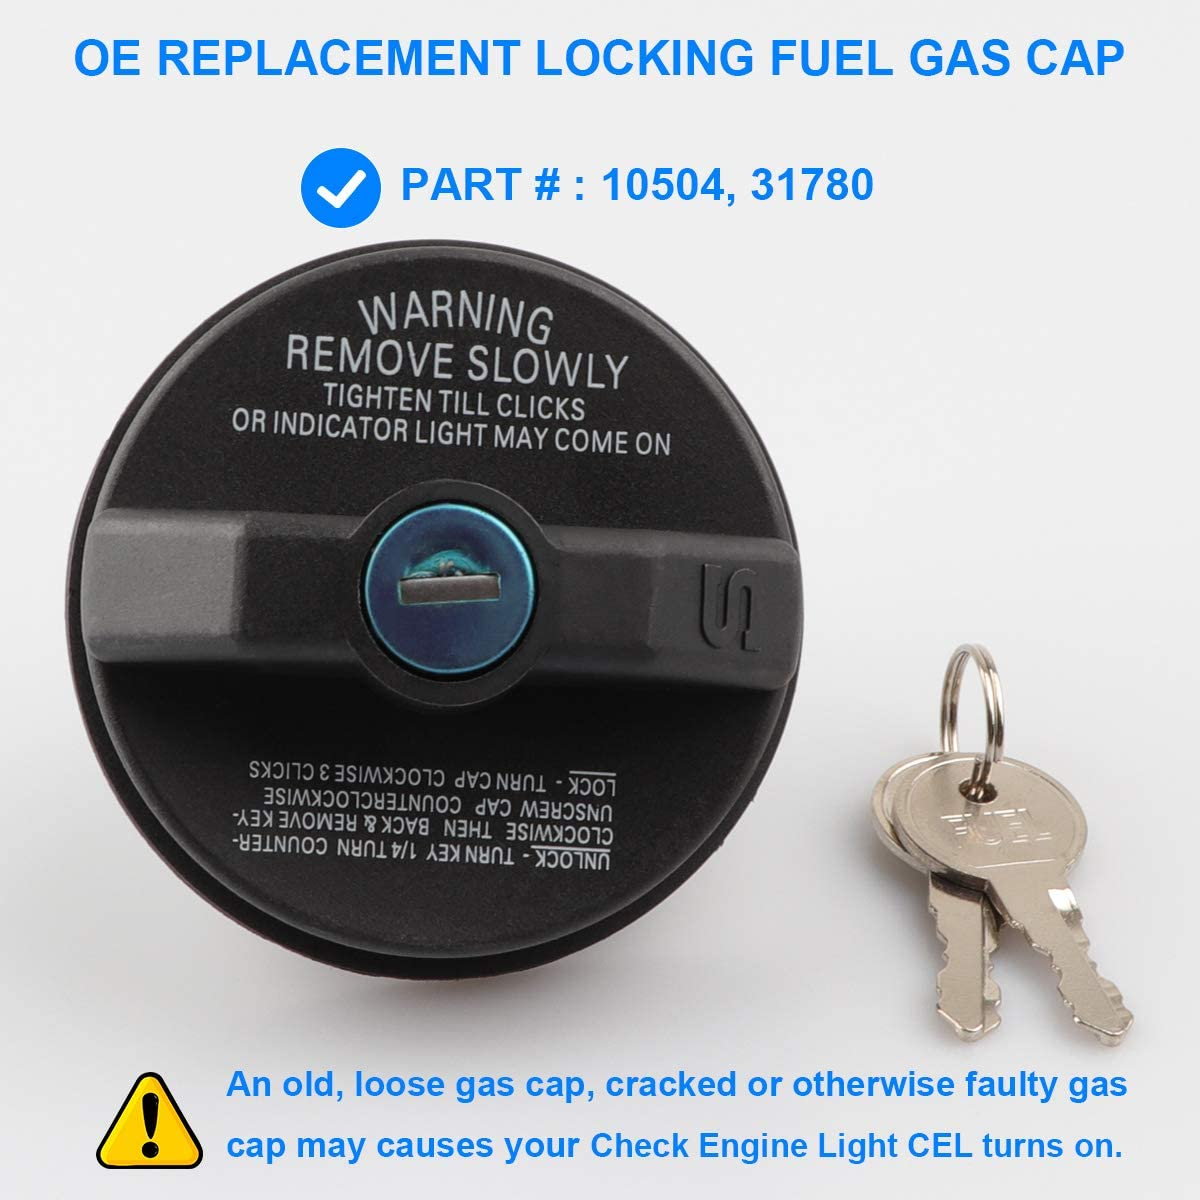 Locking Gas Fuel Cap for Buick Cadillac Chevy GMC Isuzu Olds Pontiac Saturn